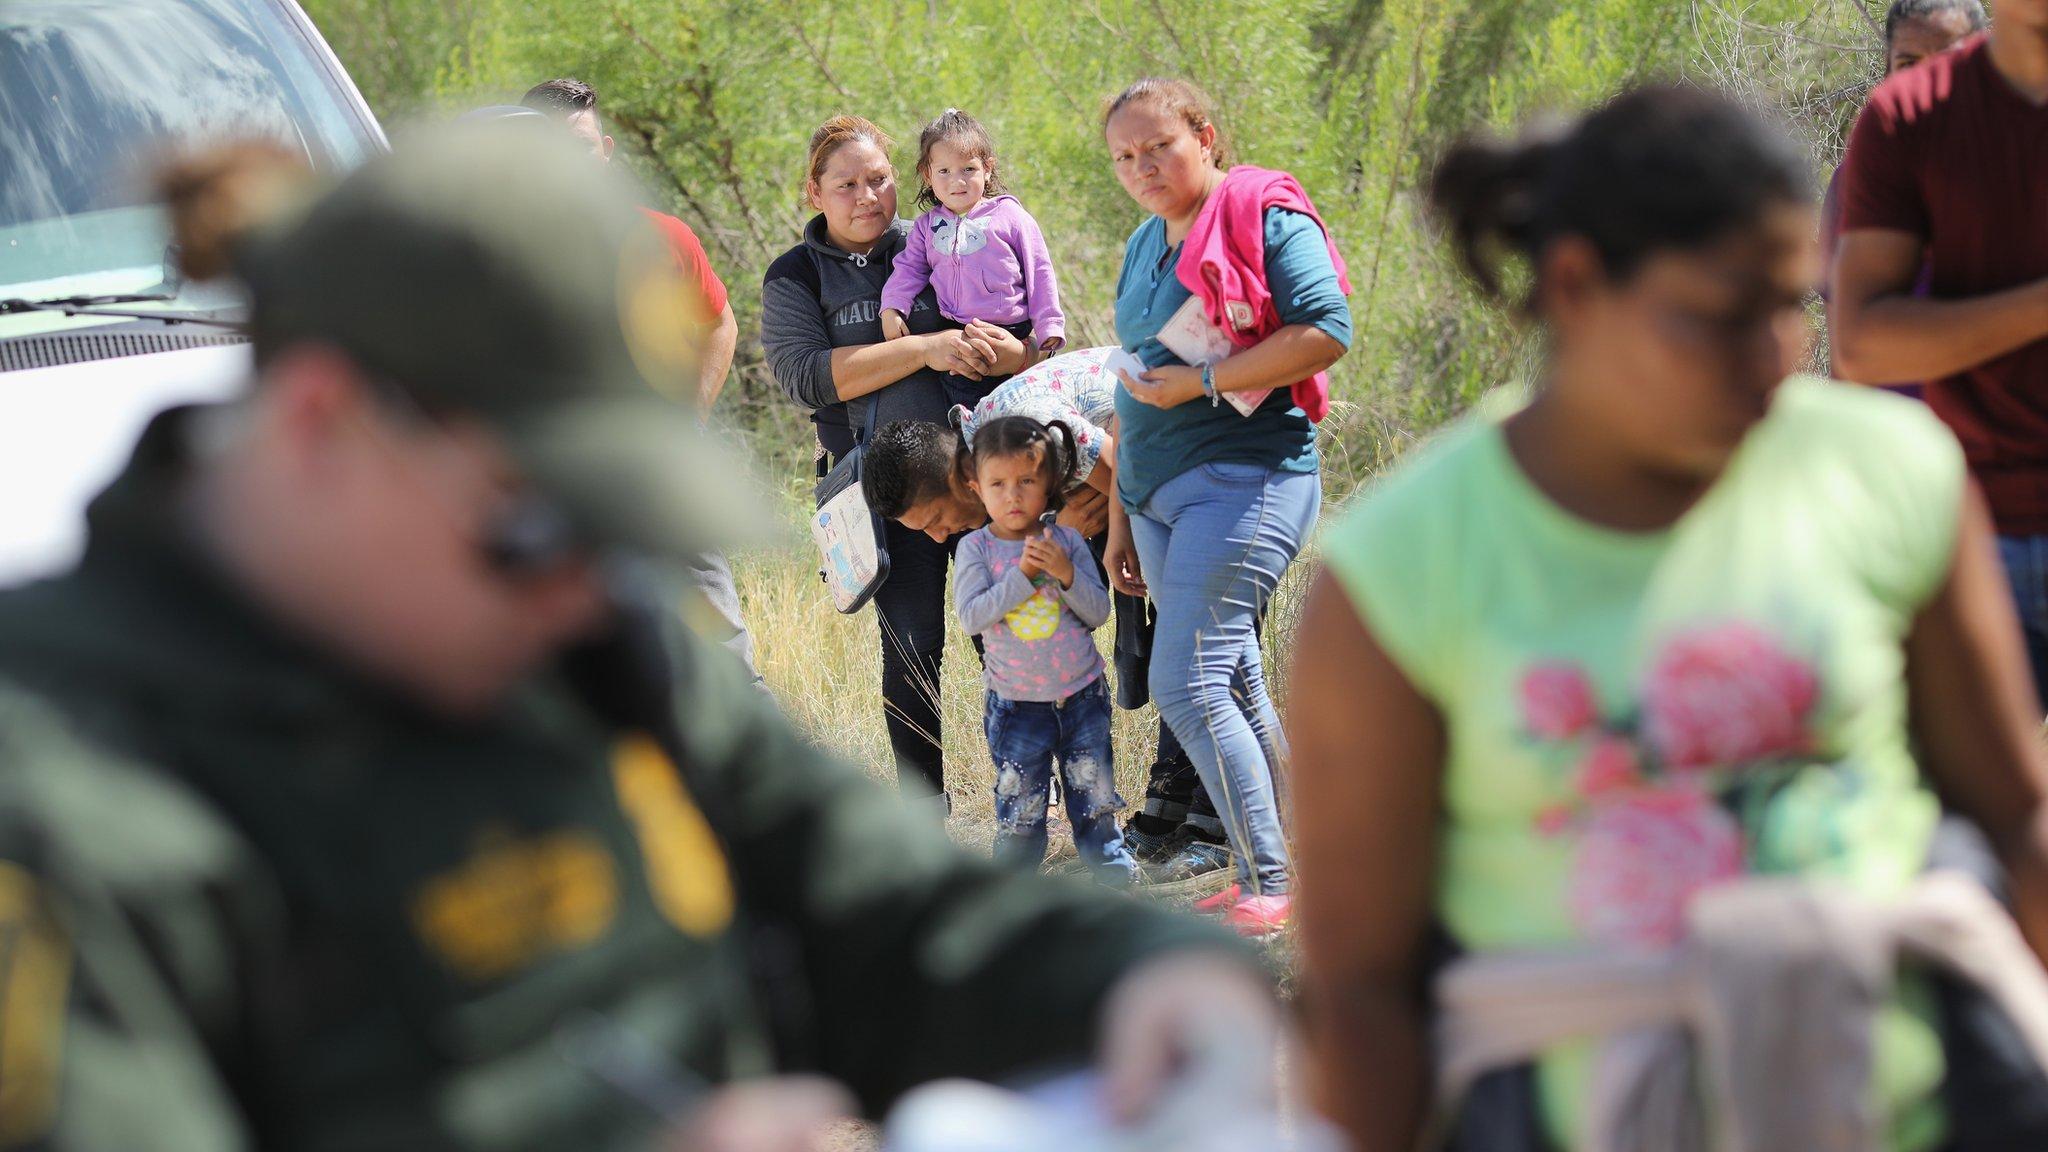 Migrant children: Republicans scramble as US border crisis grows